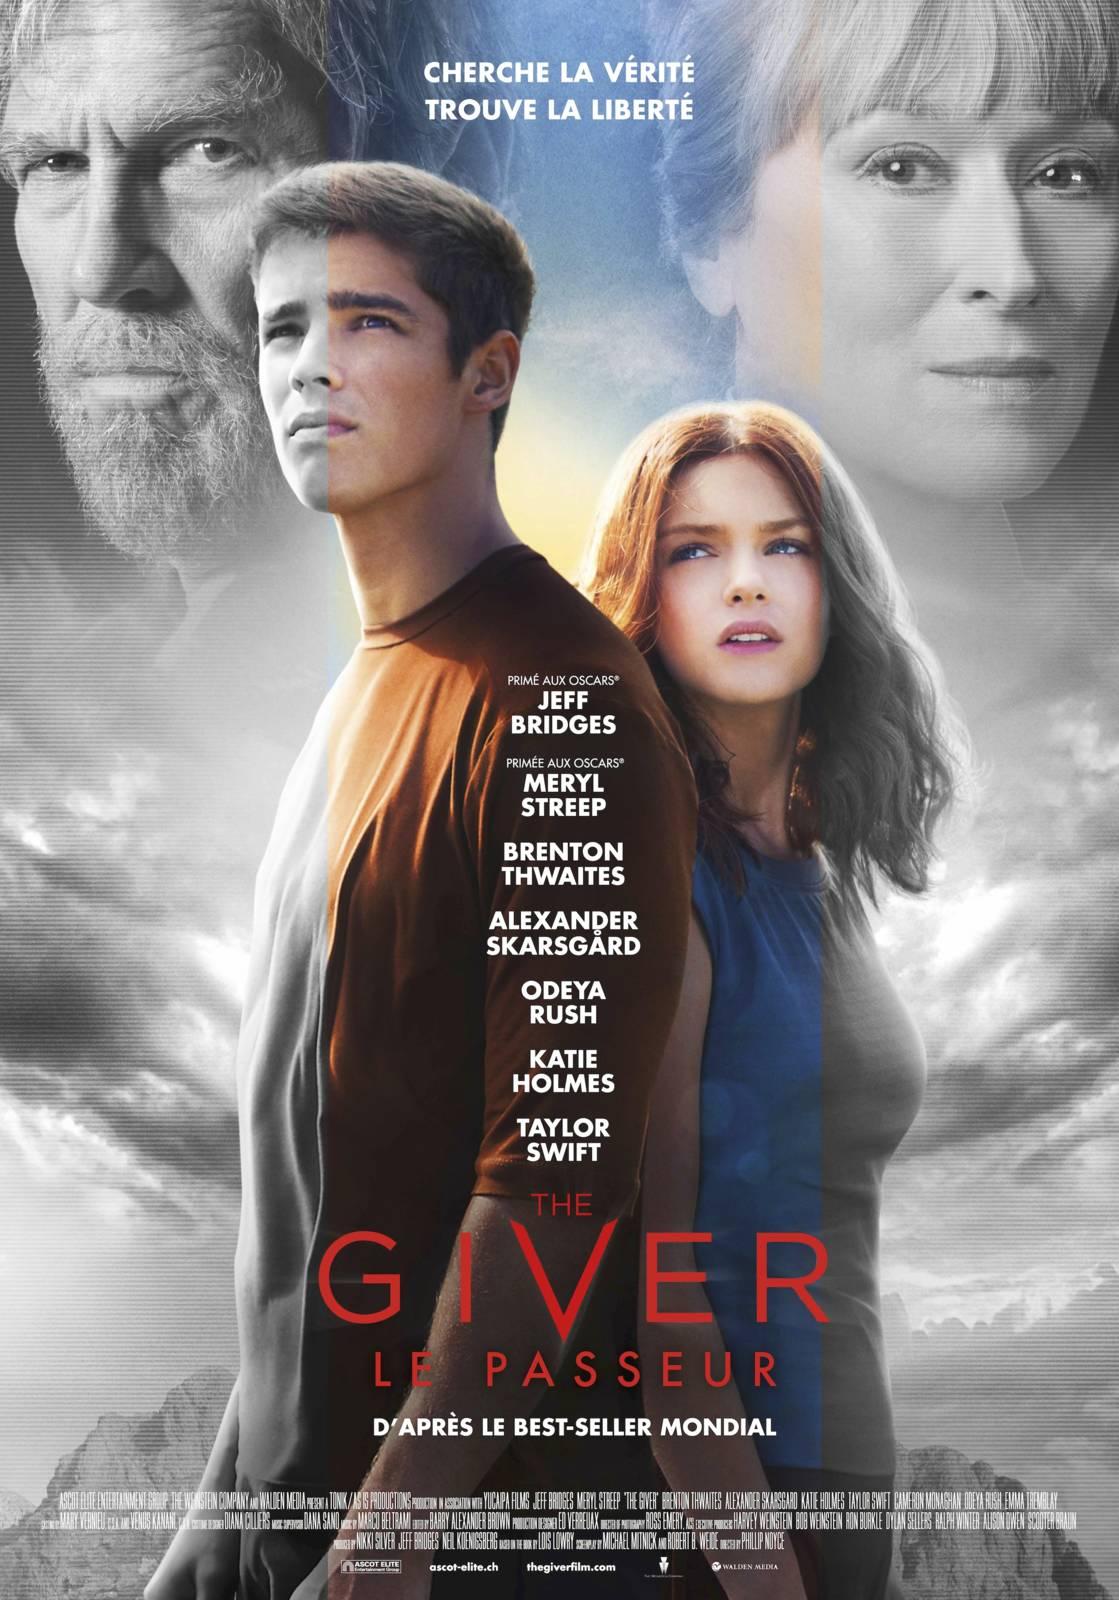 the giver etats unis 2014 97min